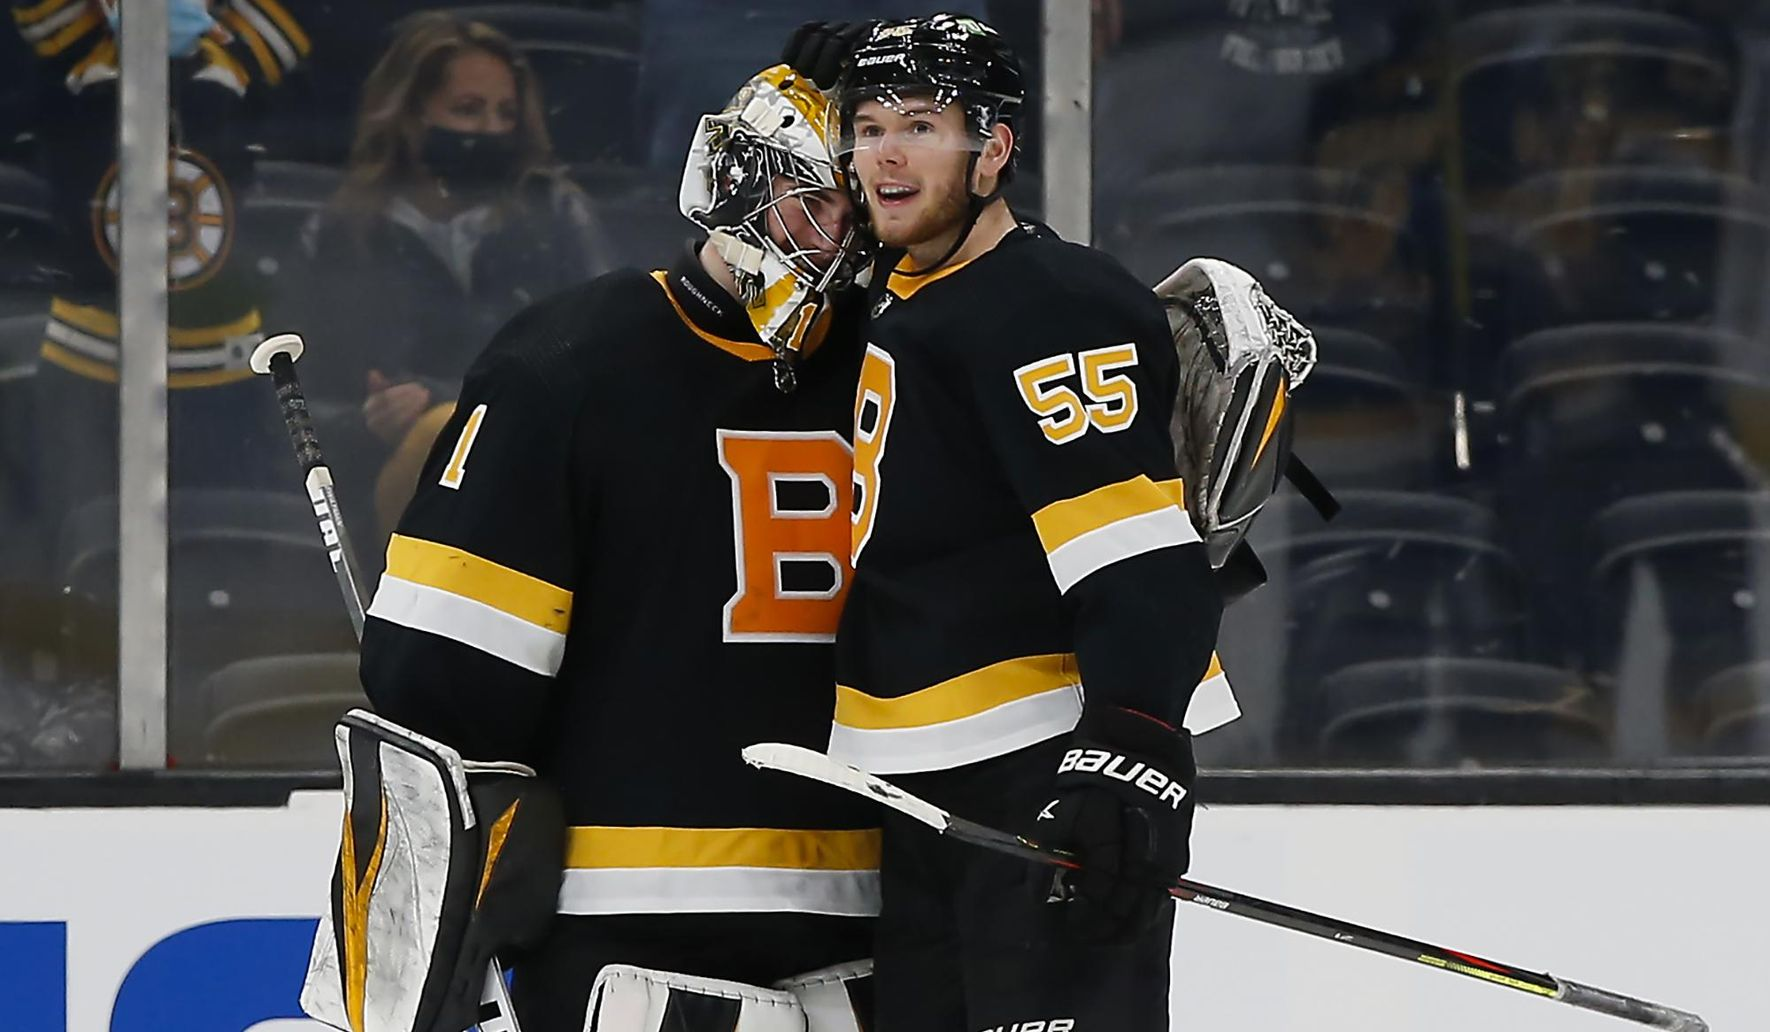 Hall, Swayman lift Bruins past Islanders 3-0